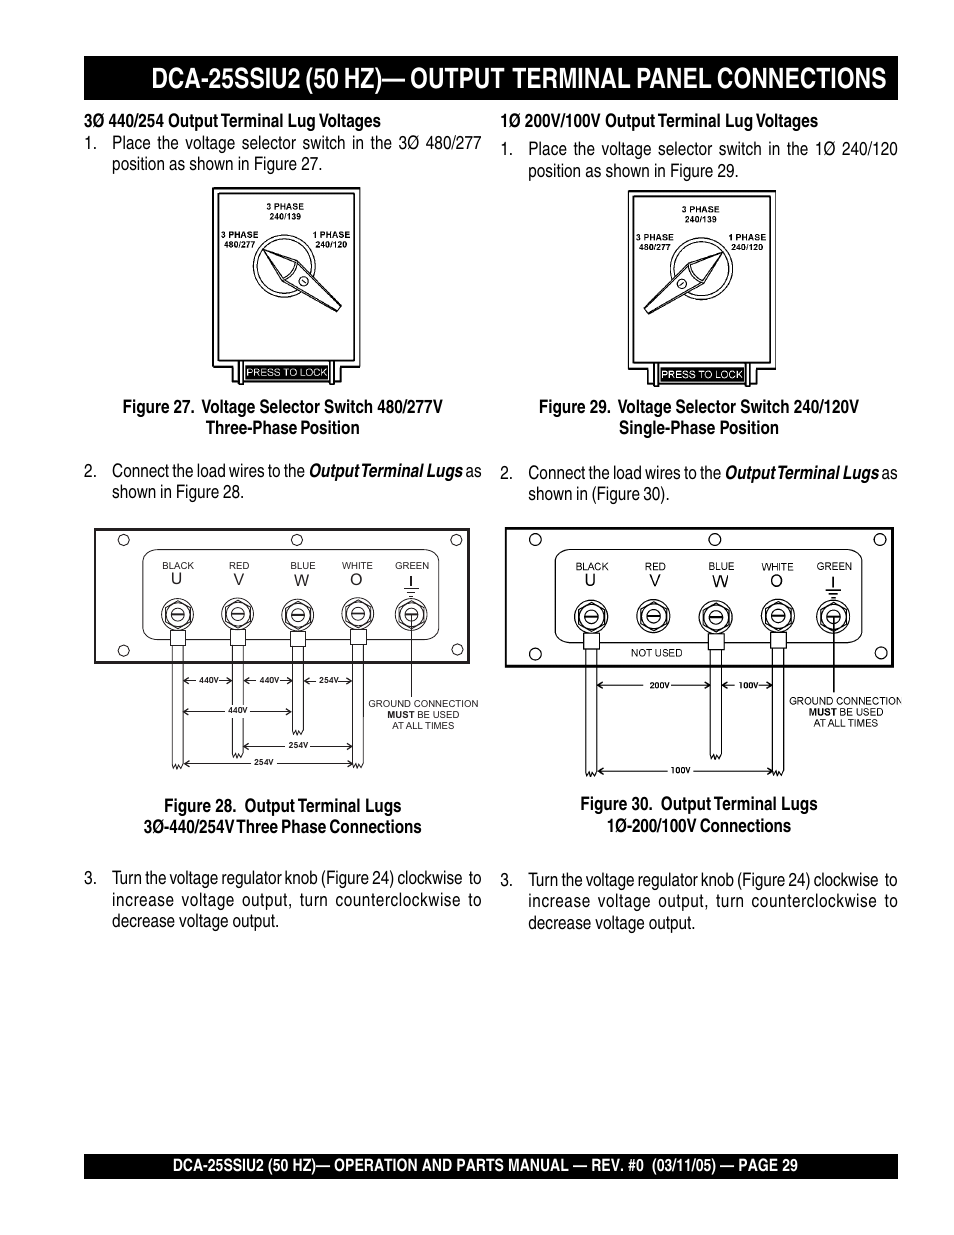 Multiquip MQ Power Whisperwatt 50 Hz Generator DCA-25SSIU2 User Manual |  Page 29 / 82 | Also for: DCA25SSIU2